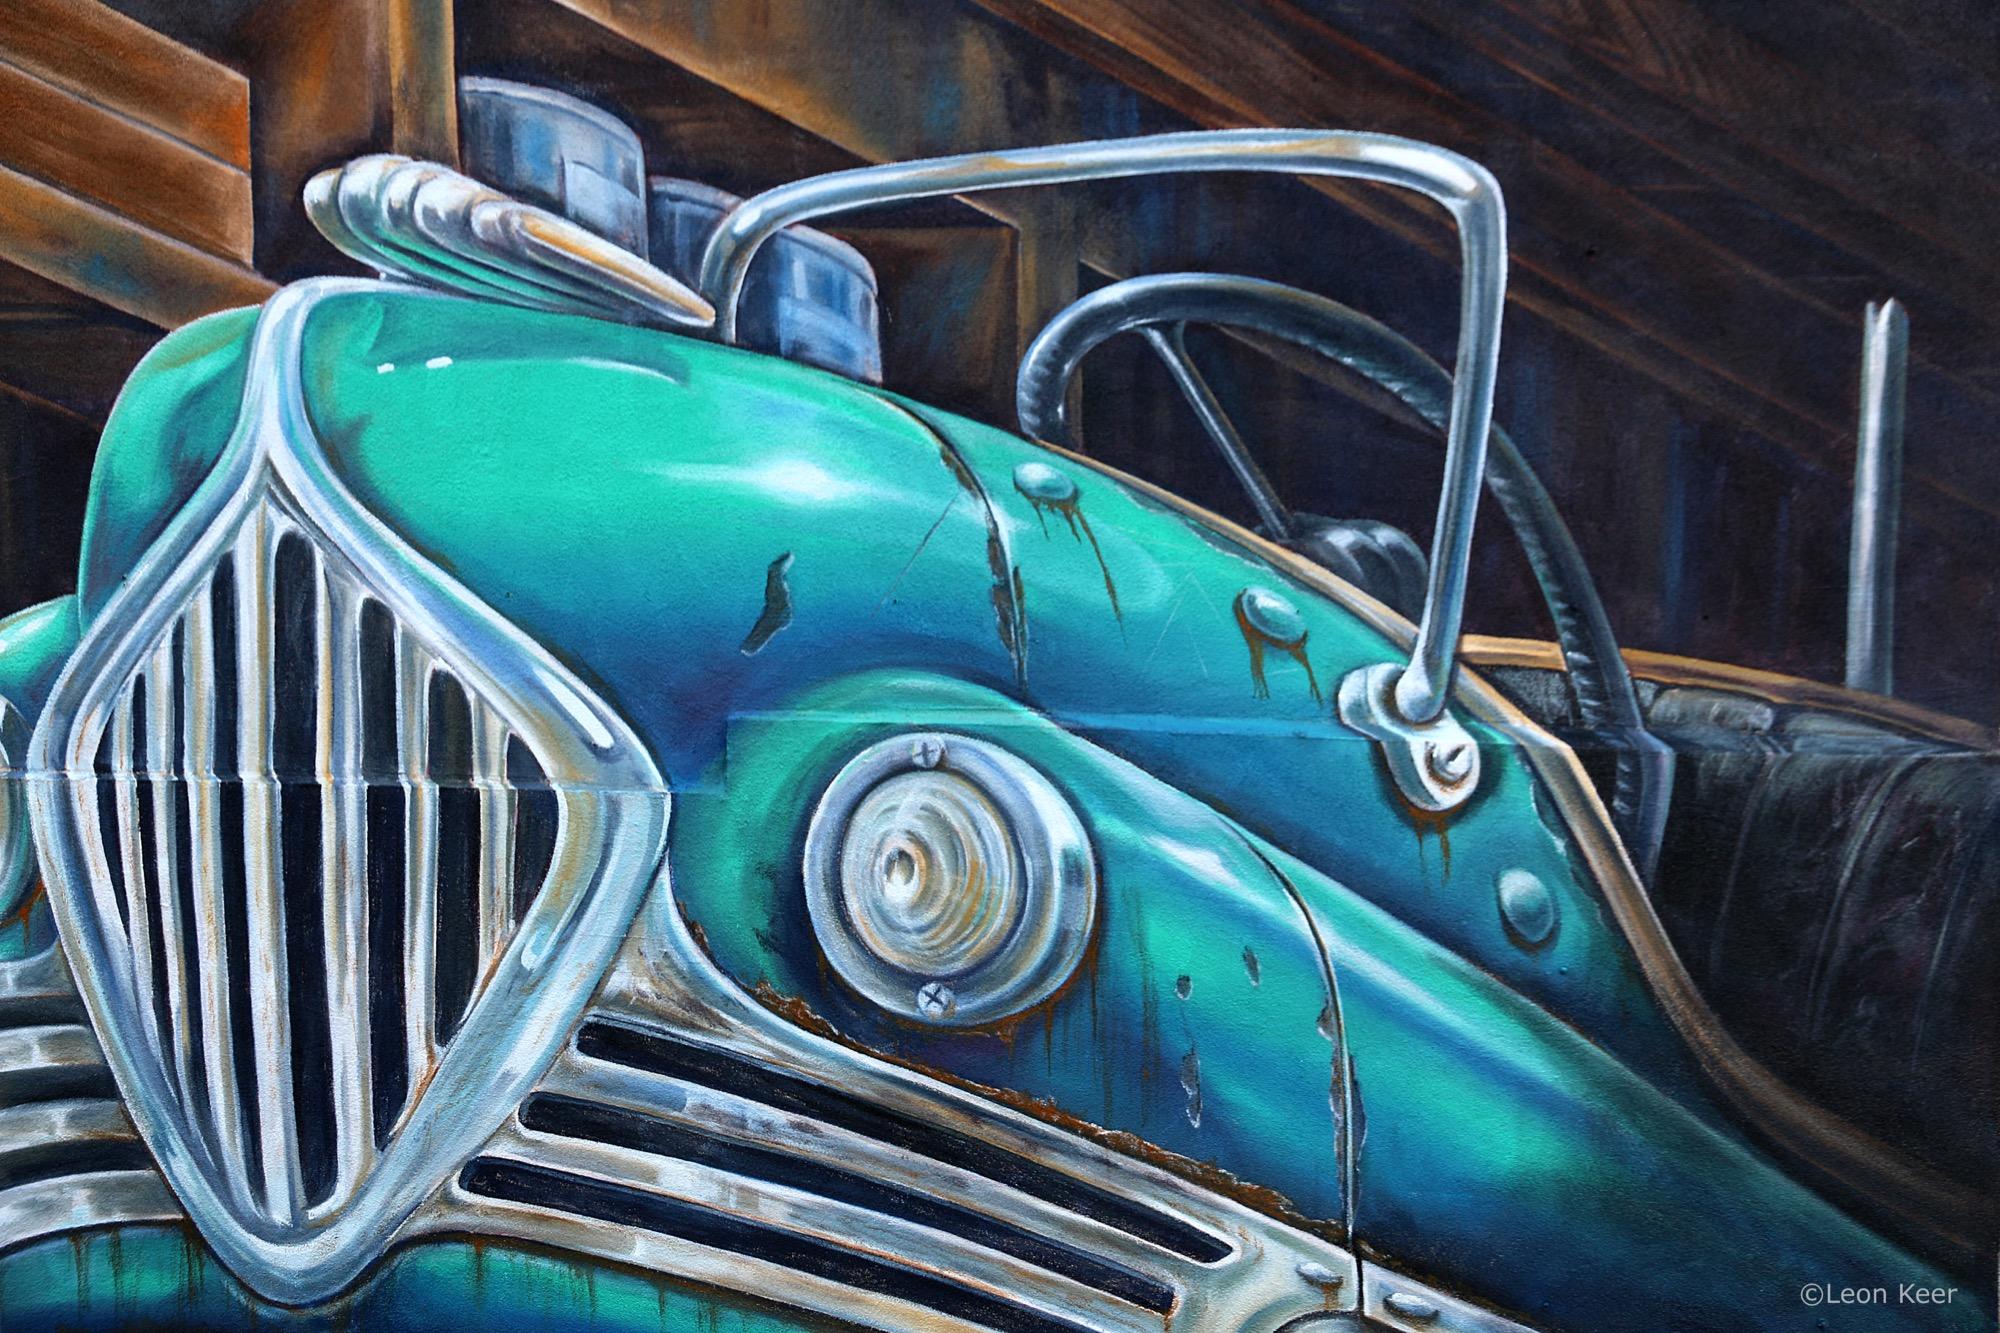 Leon Keer in Long Beach, California Artes & contextos bumpercar mural powwow leonkeer 43242351322 o